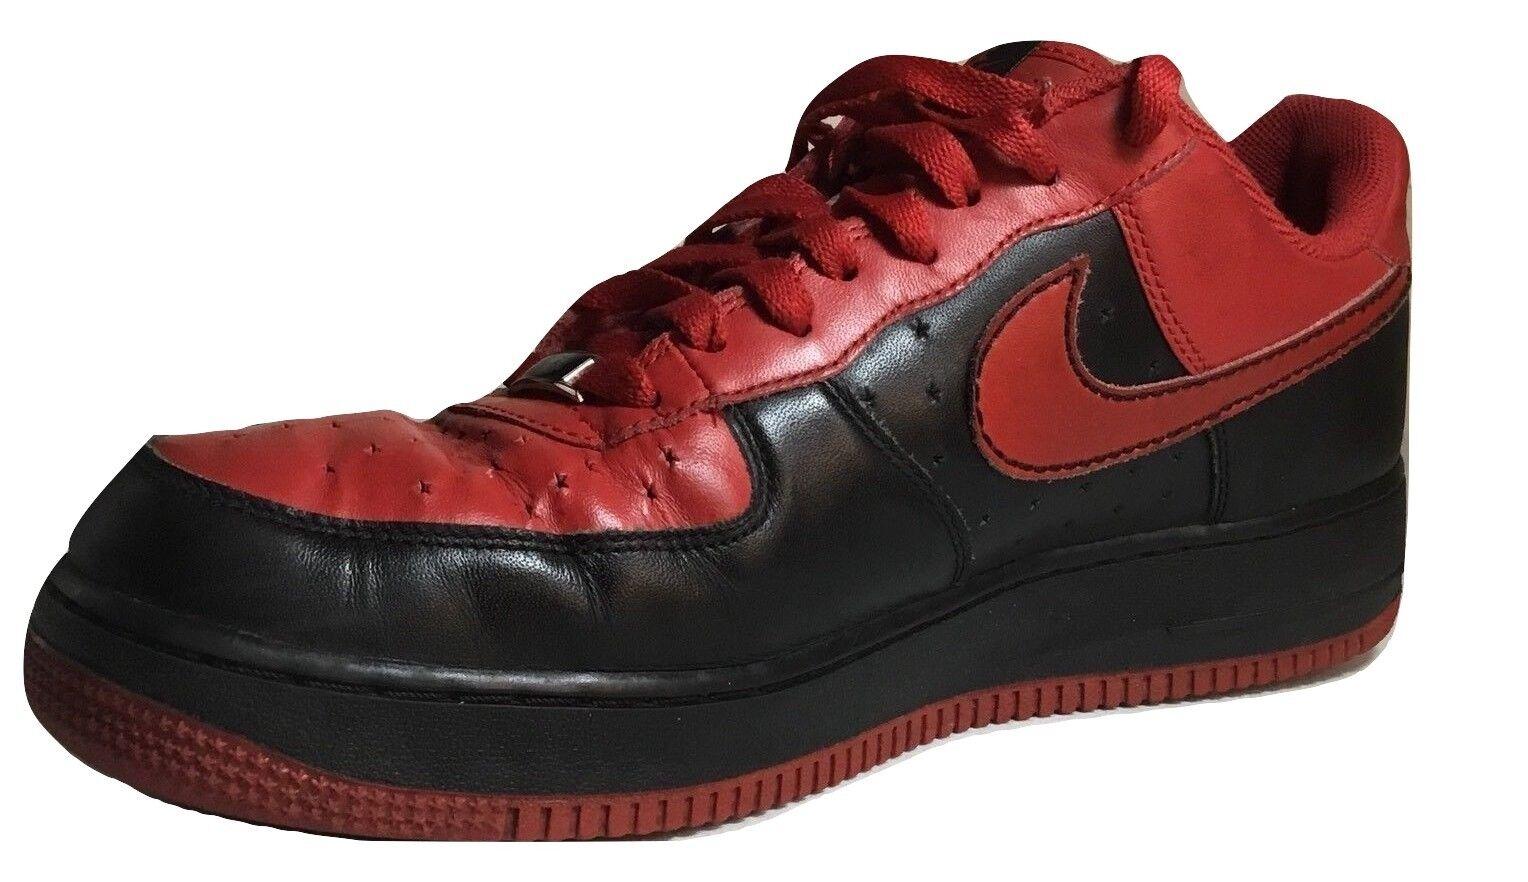 Nike Air Force 1 '82 Low AF-1 , Blk & Red Men's Size 11